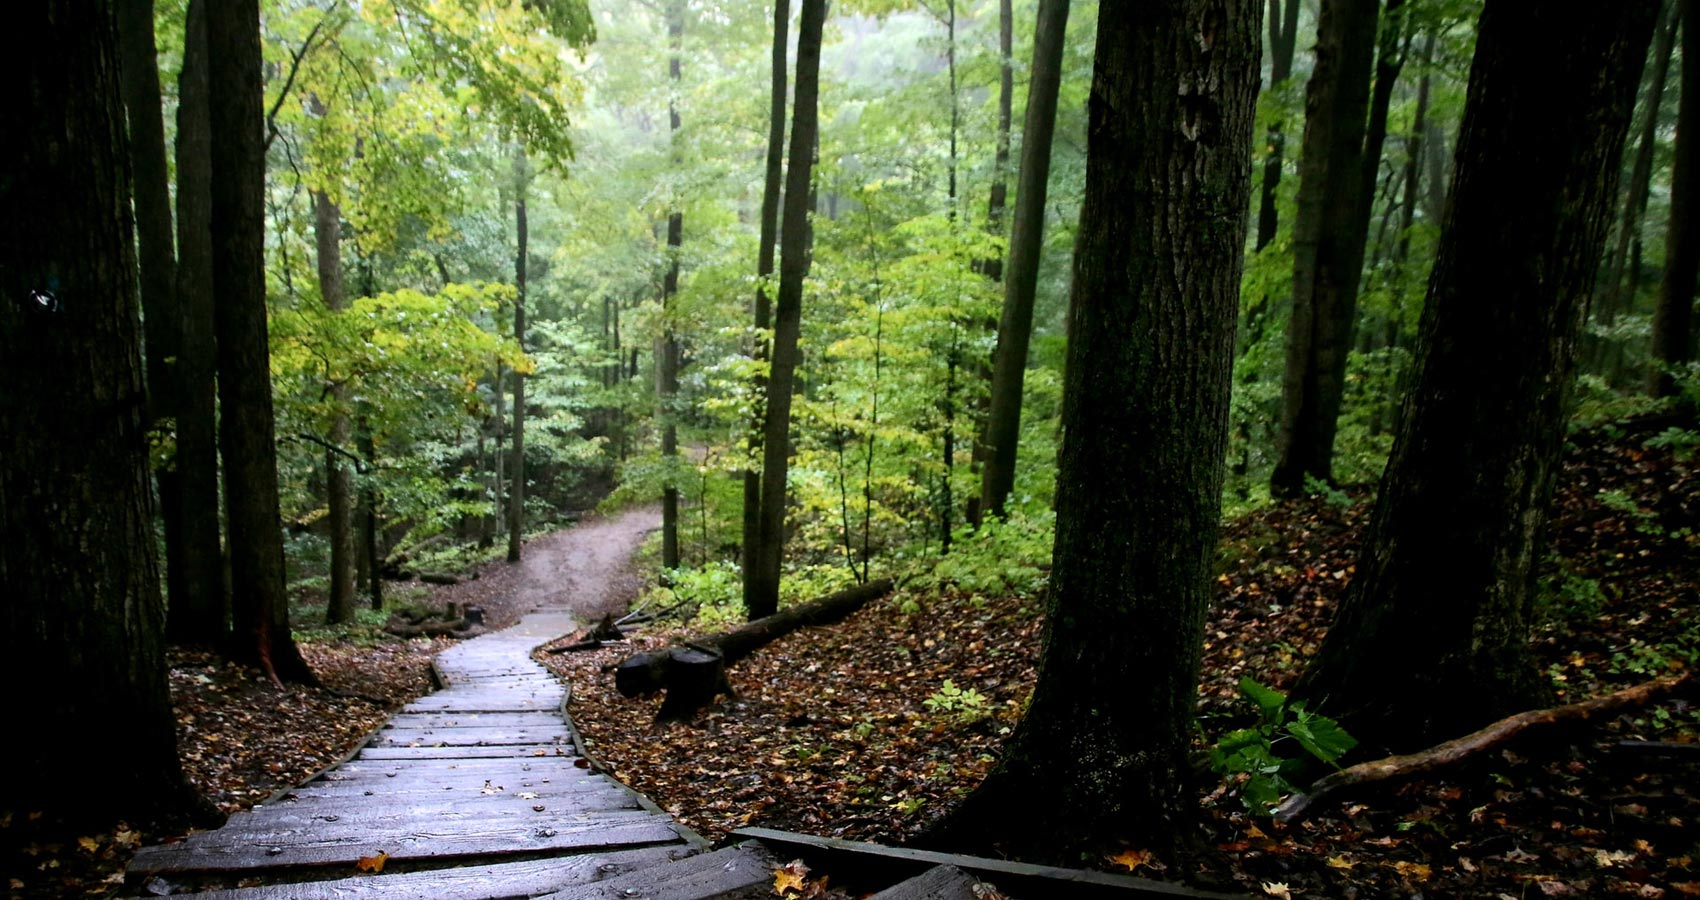 Maine Appalachian Trail Mystery, story by John R. Cobb at Spillwords.com